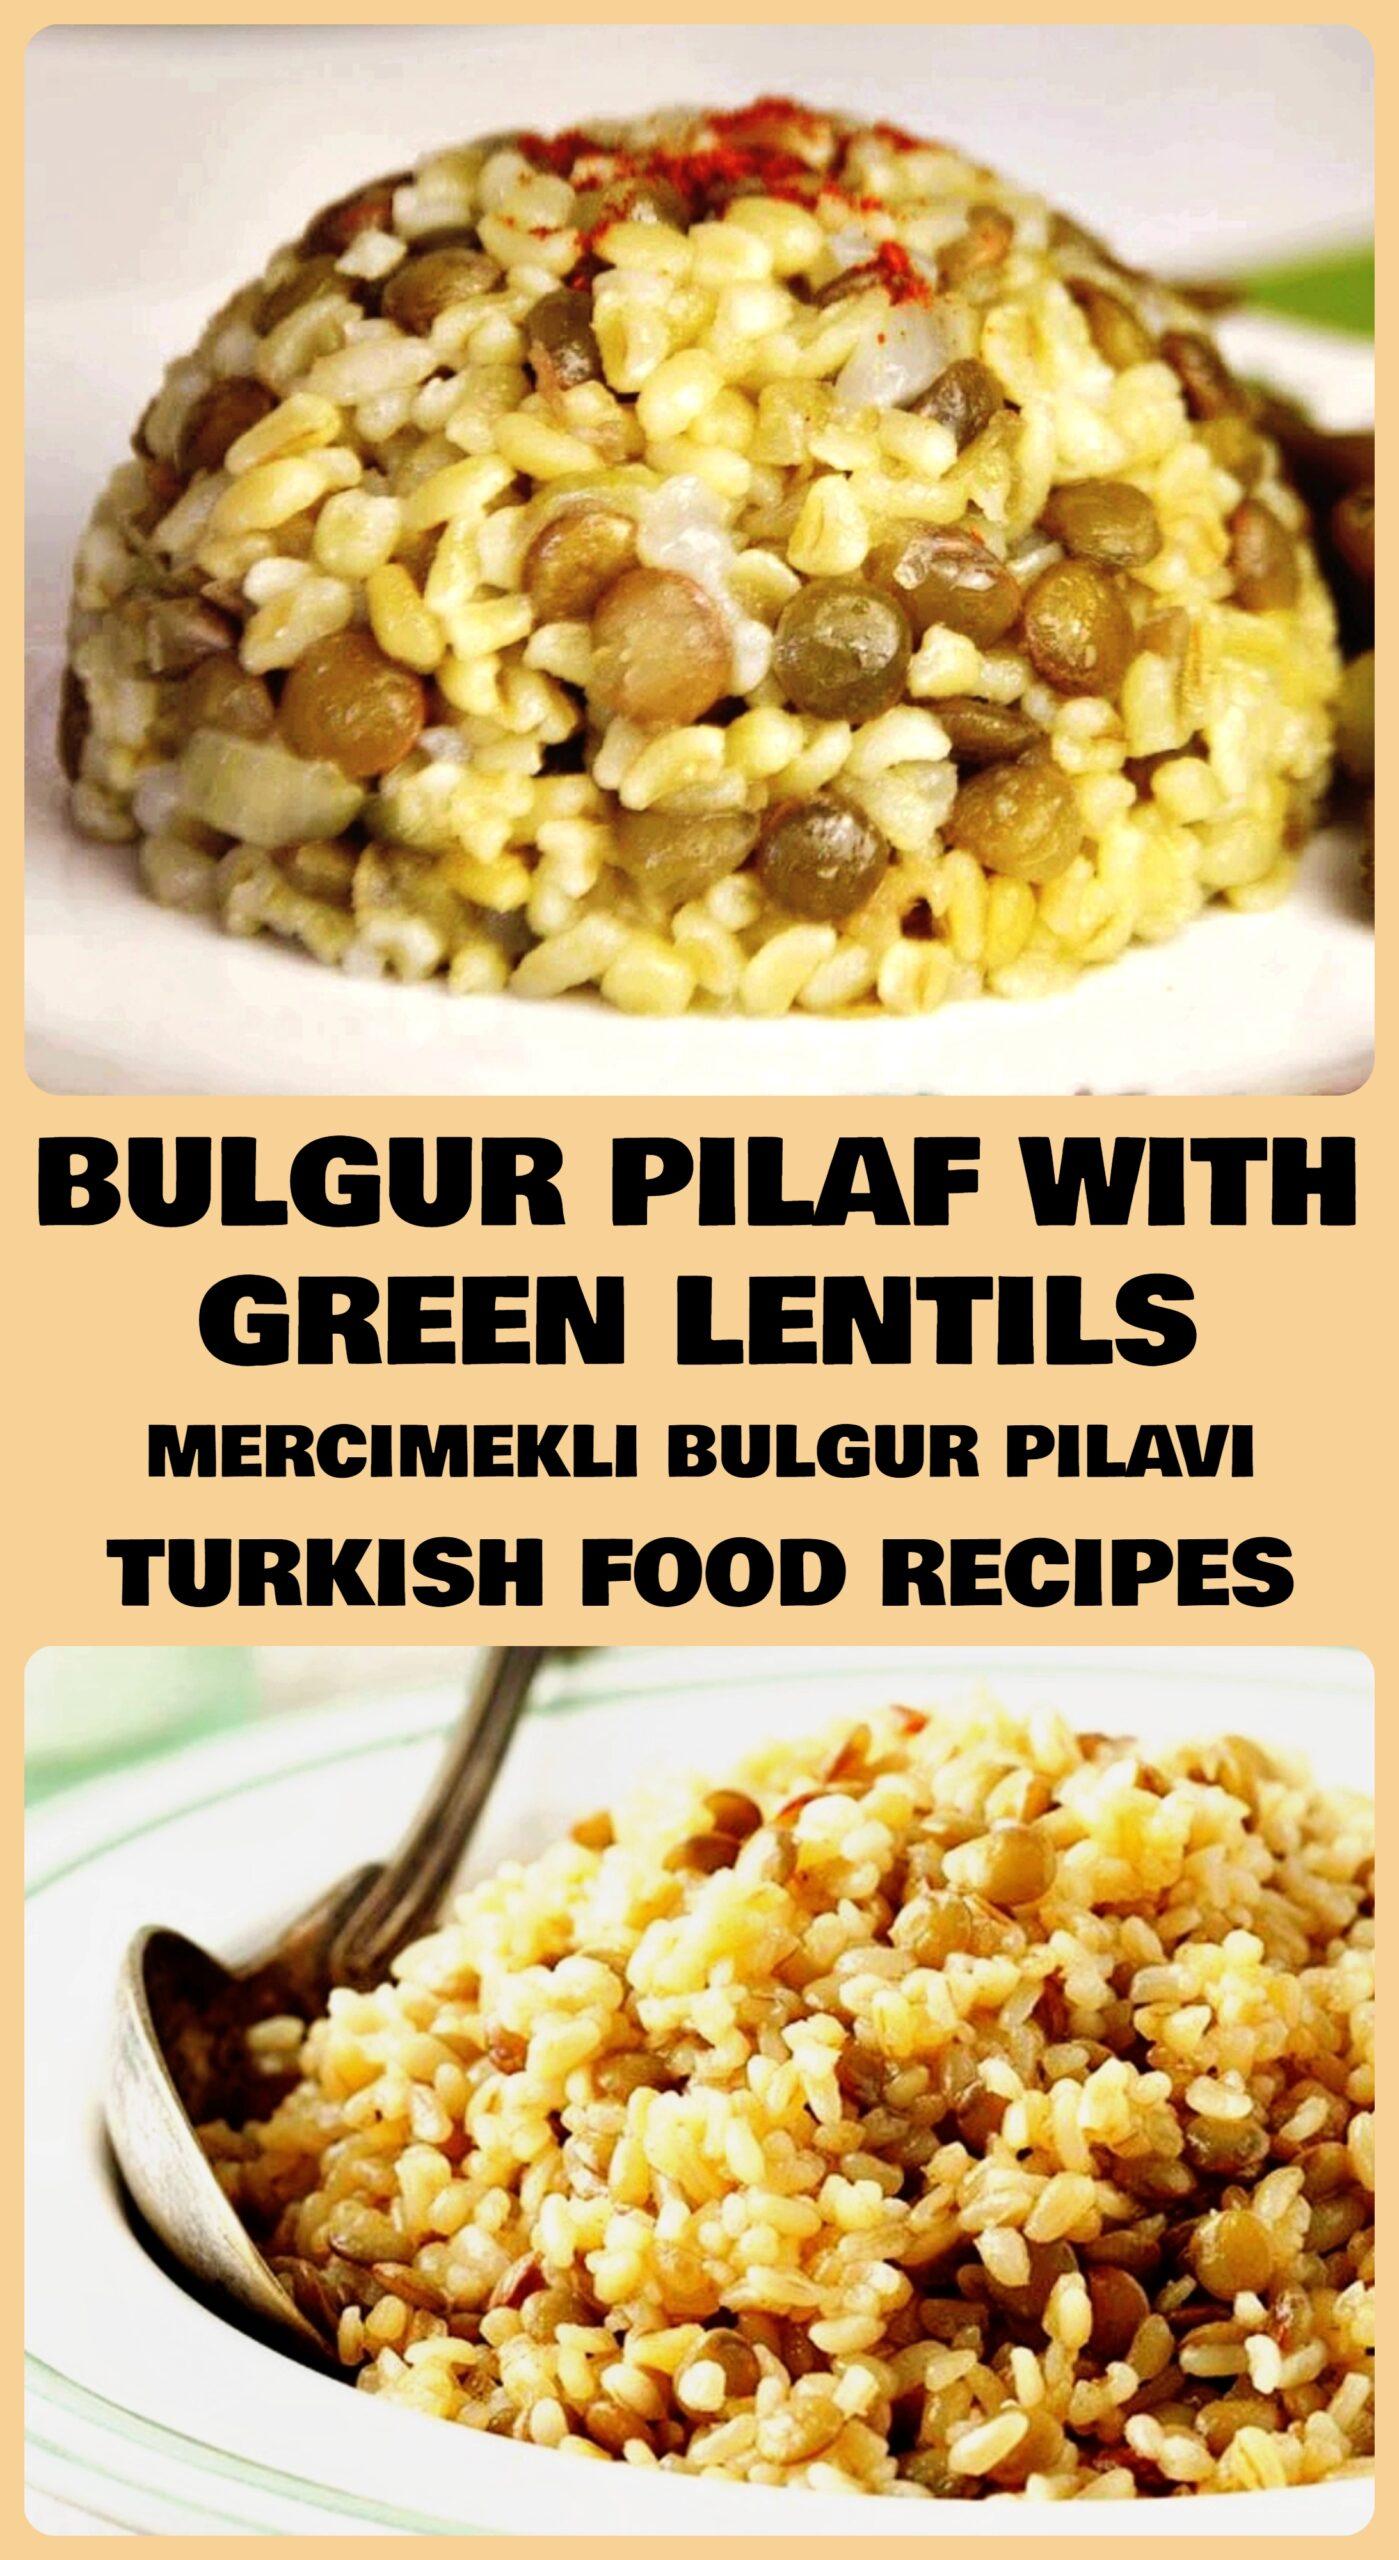 Bulgur Pilaf with Green Lentils - Mercimekli Bulgur Pilavi Recipe